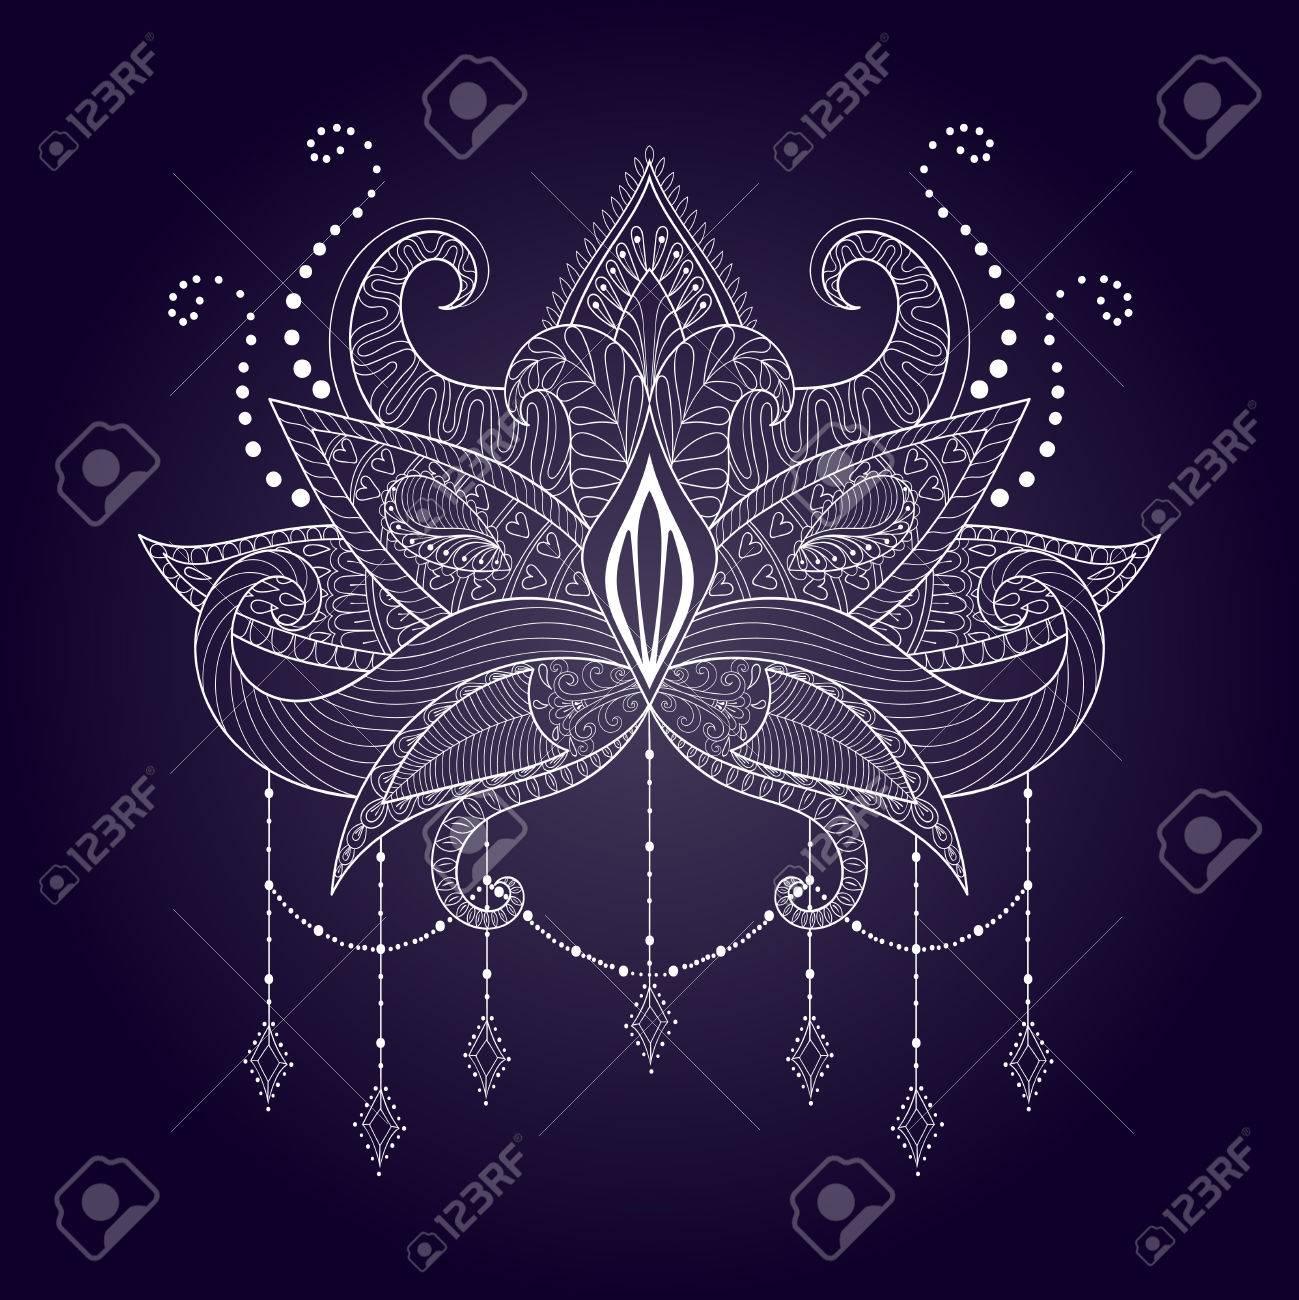 Boho Ornamental White Lotus Flower Blackwork Tattoo Design Indian